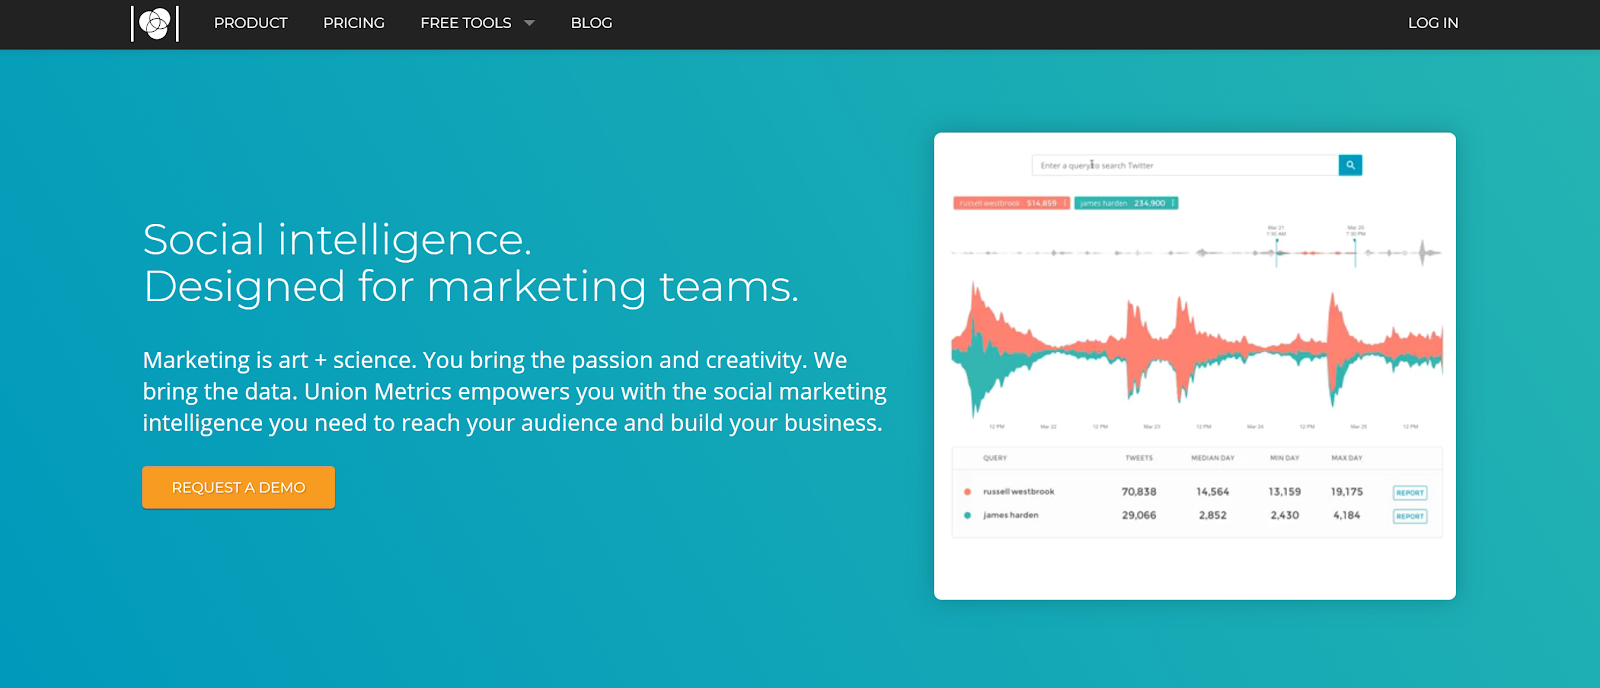 Union Metrics instagram marketing platform  homepage.